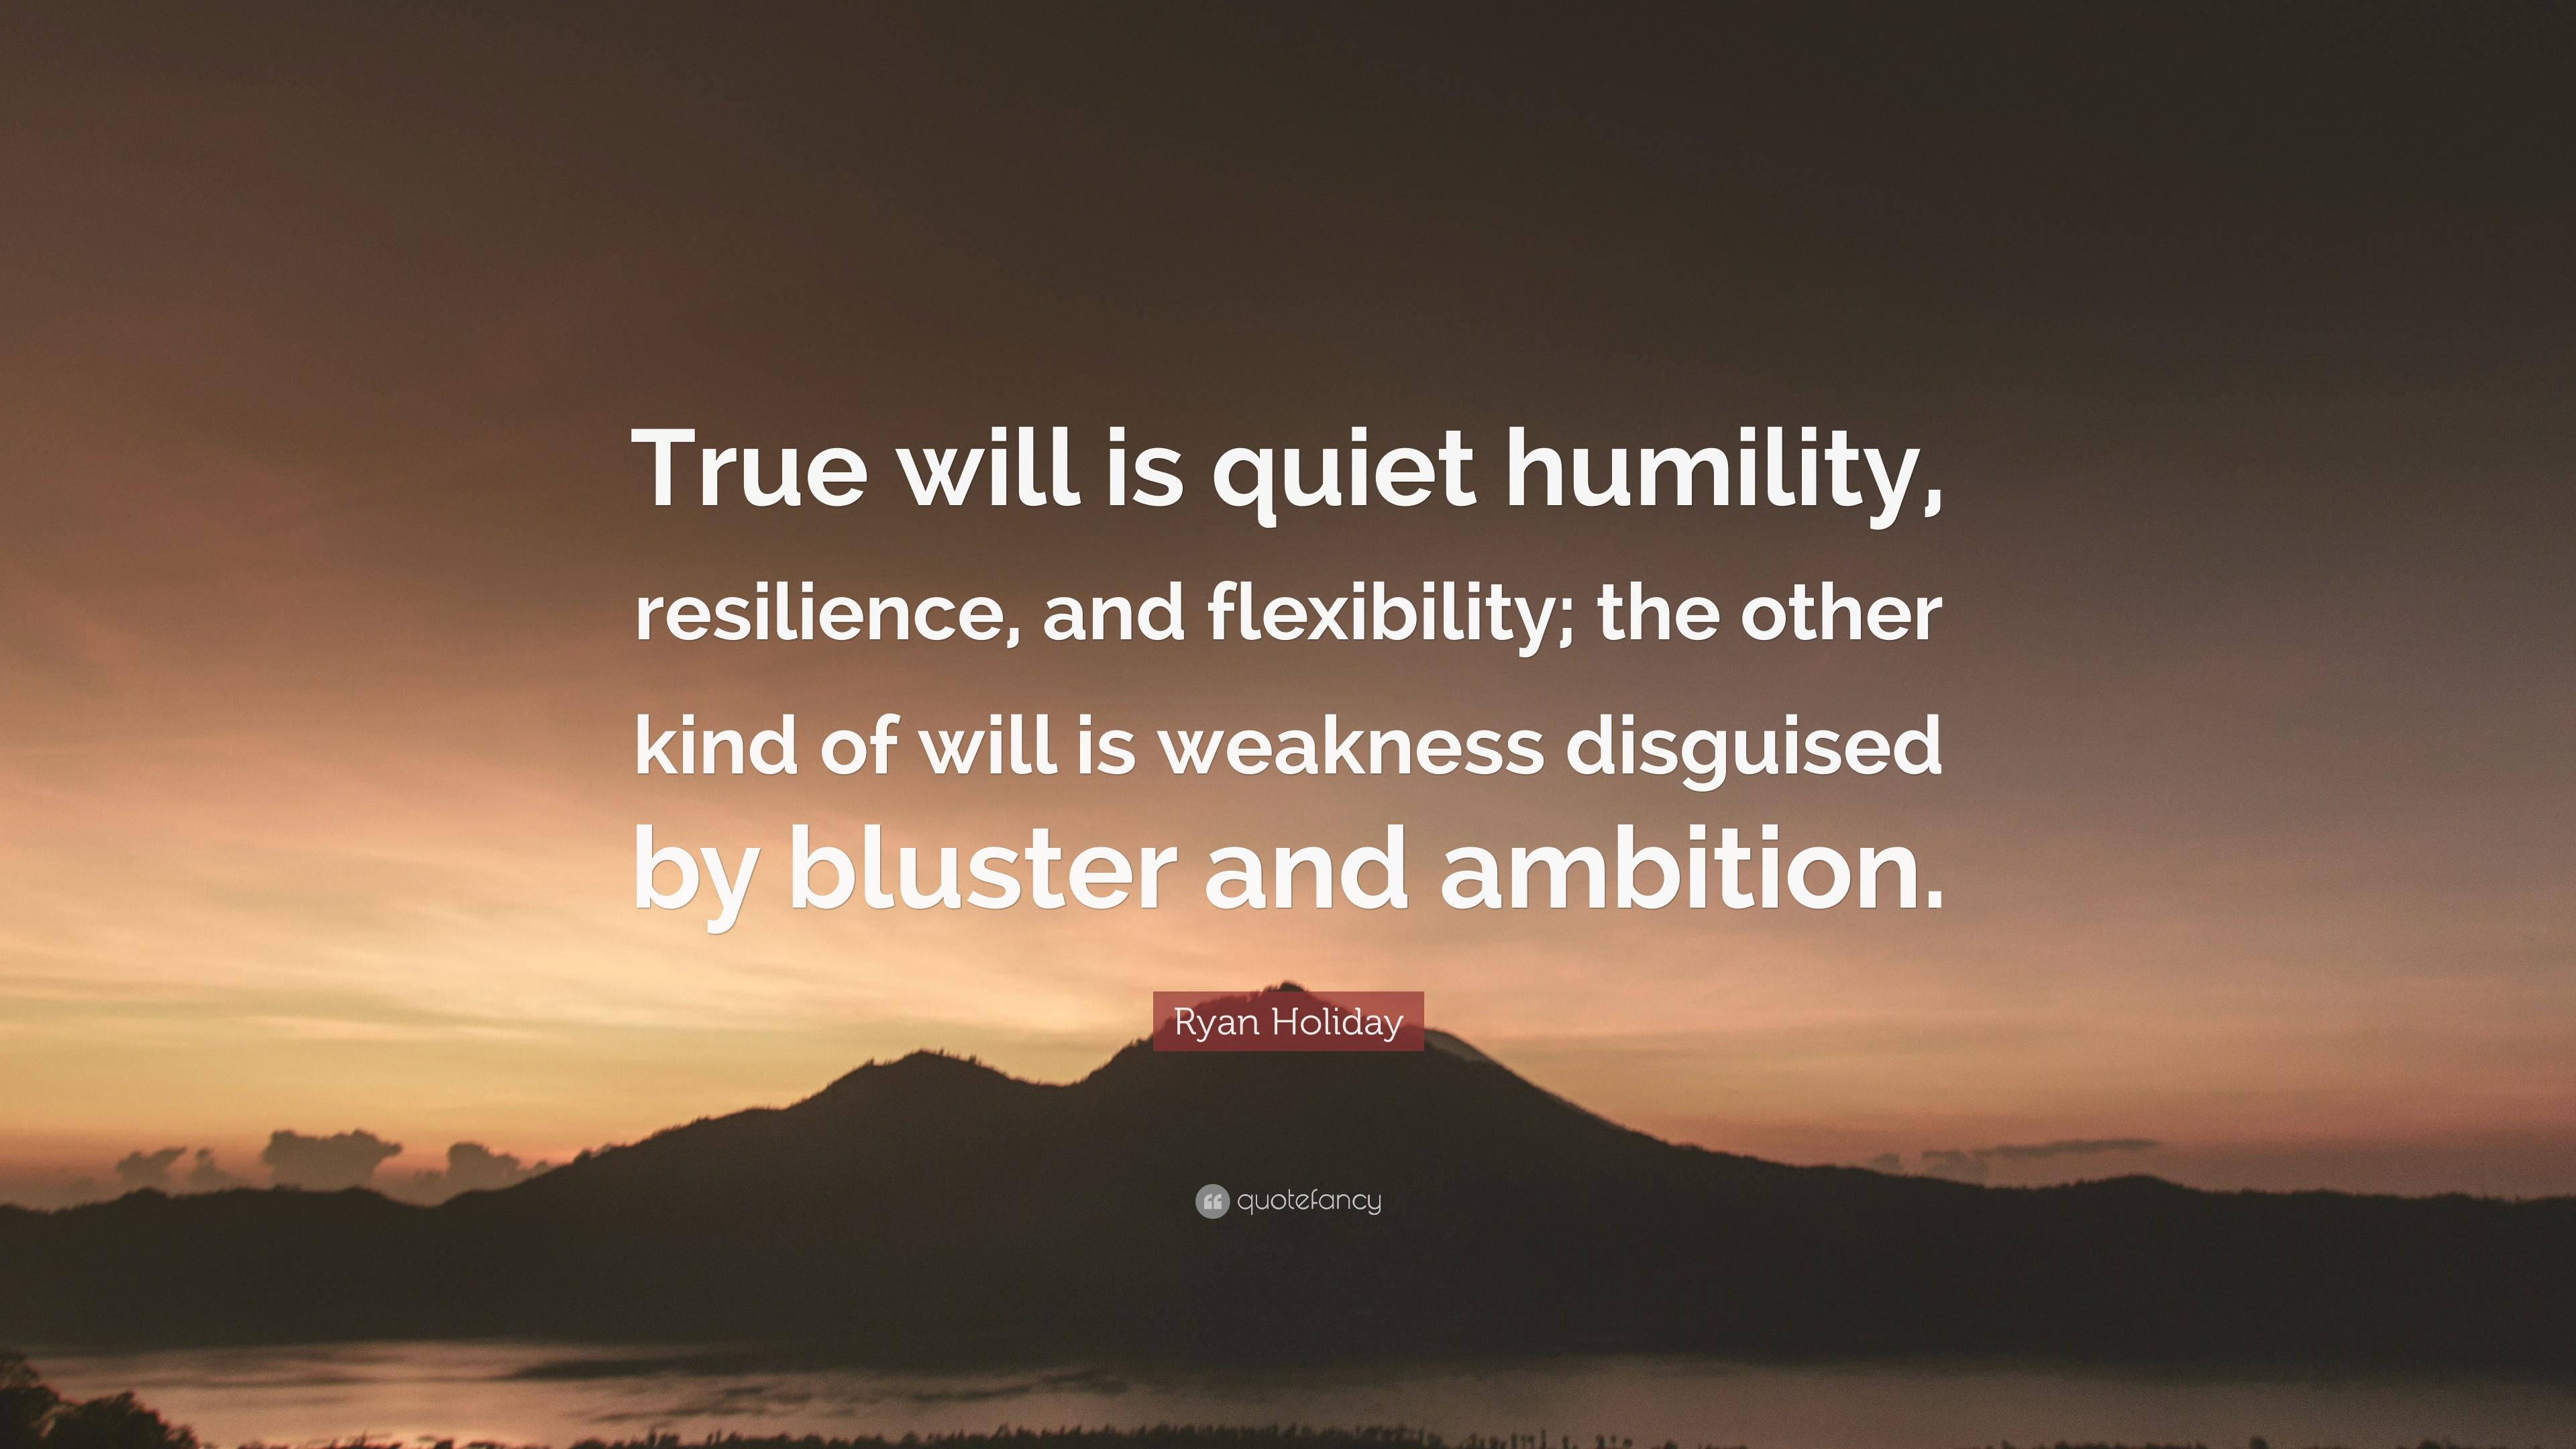 True Will is Quiet Humilty.jpg